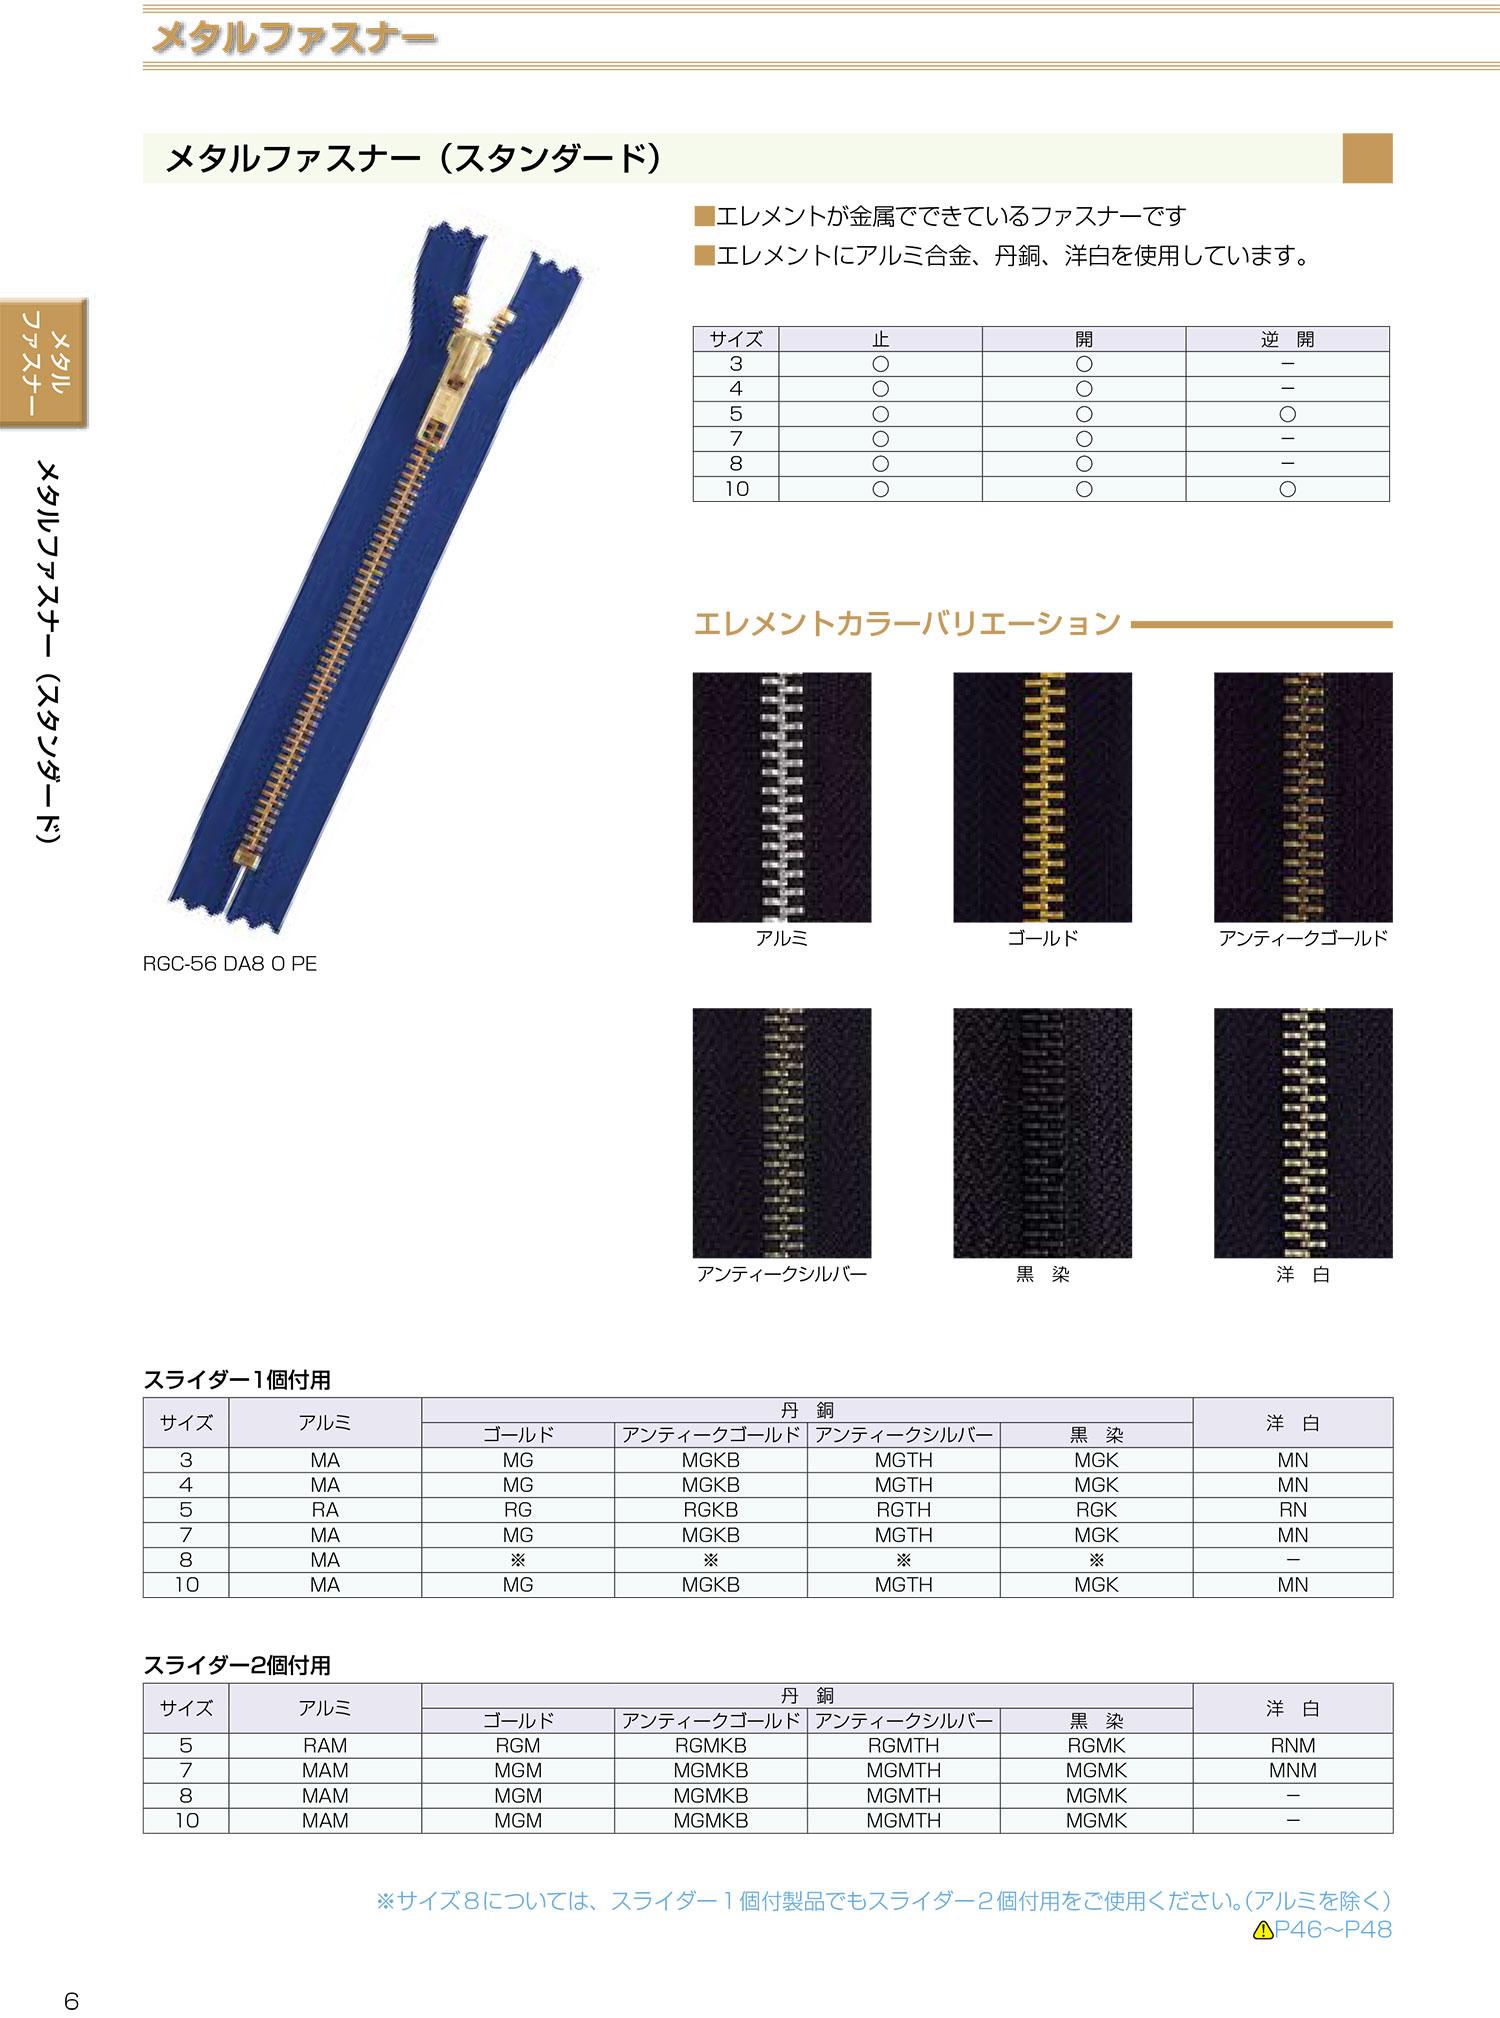 5RGOR YKKメタルファスナー 5サイズ ゴールド オープン YKK/オークラ商事 - ApparelX アパレル資材卸通販